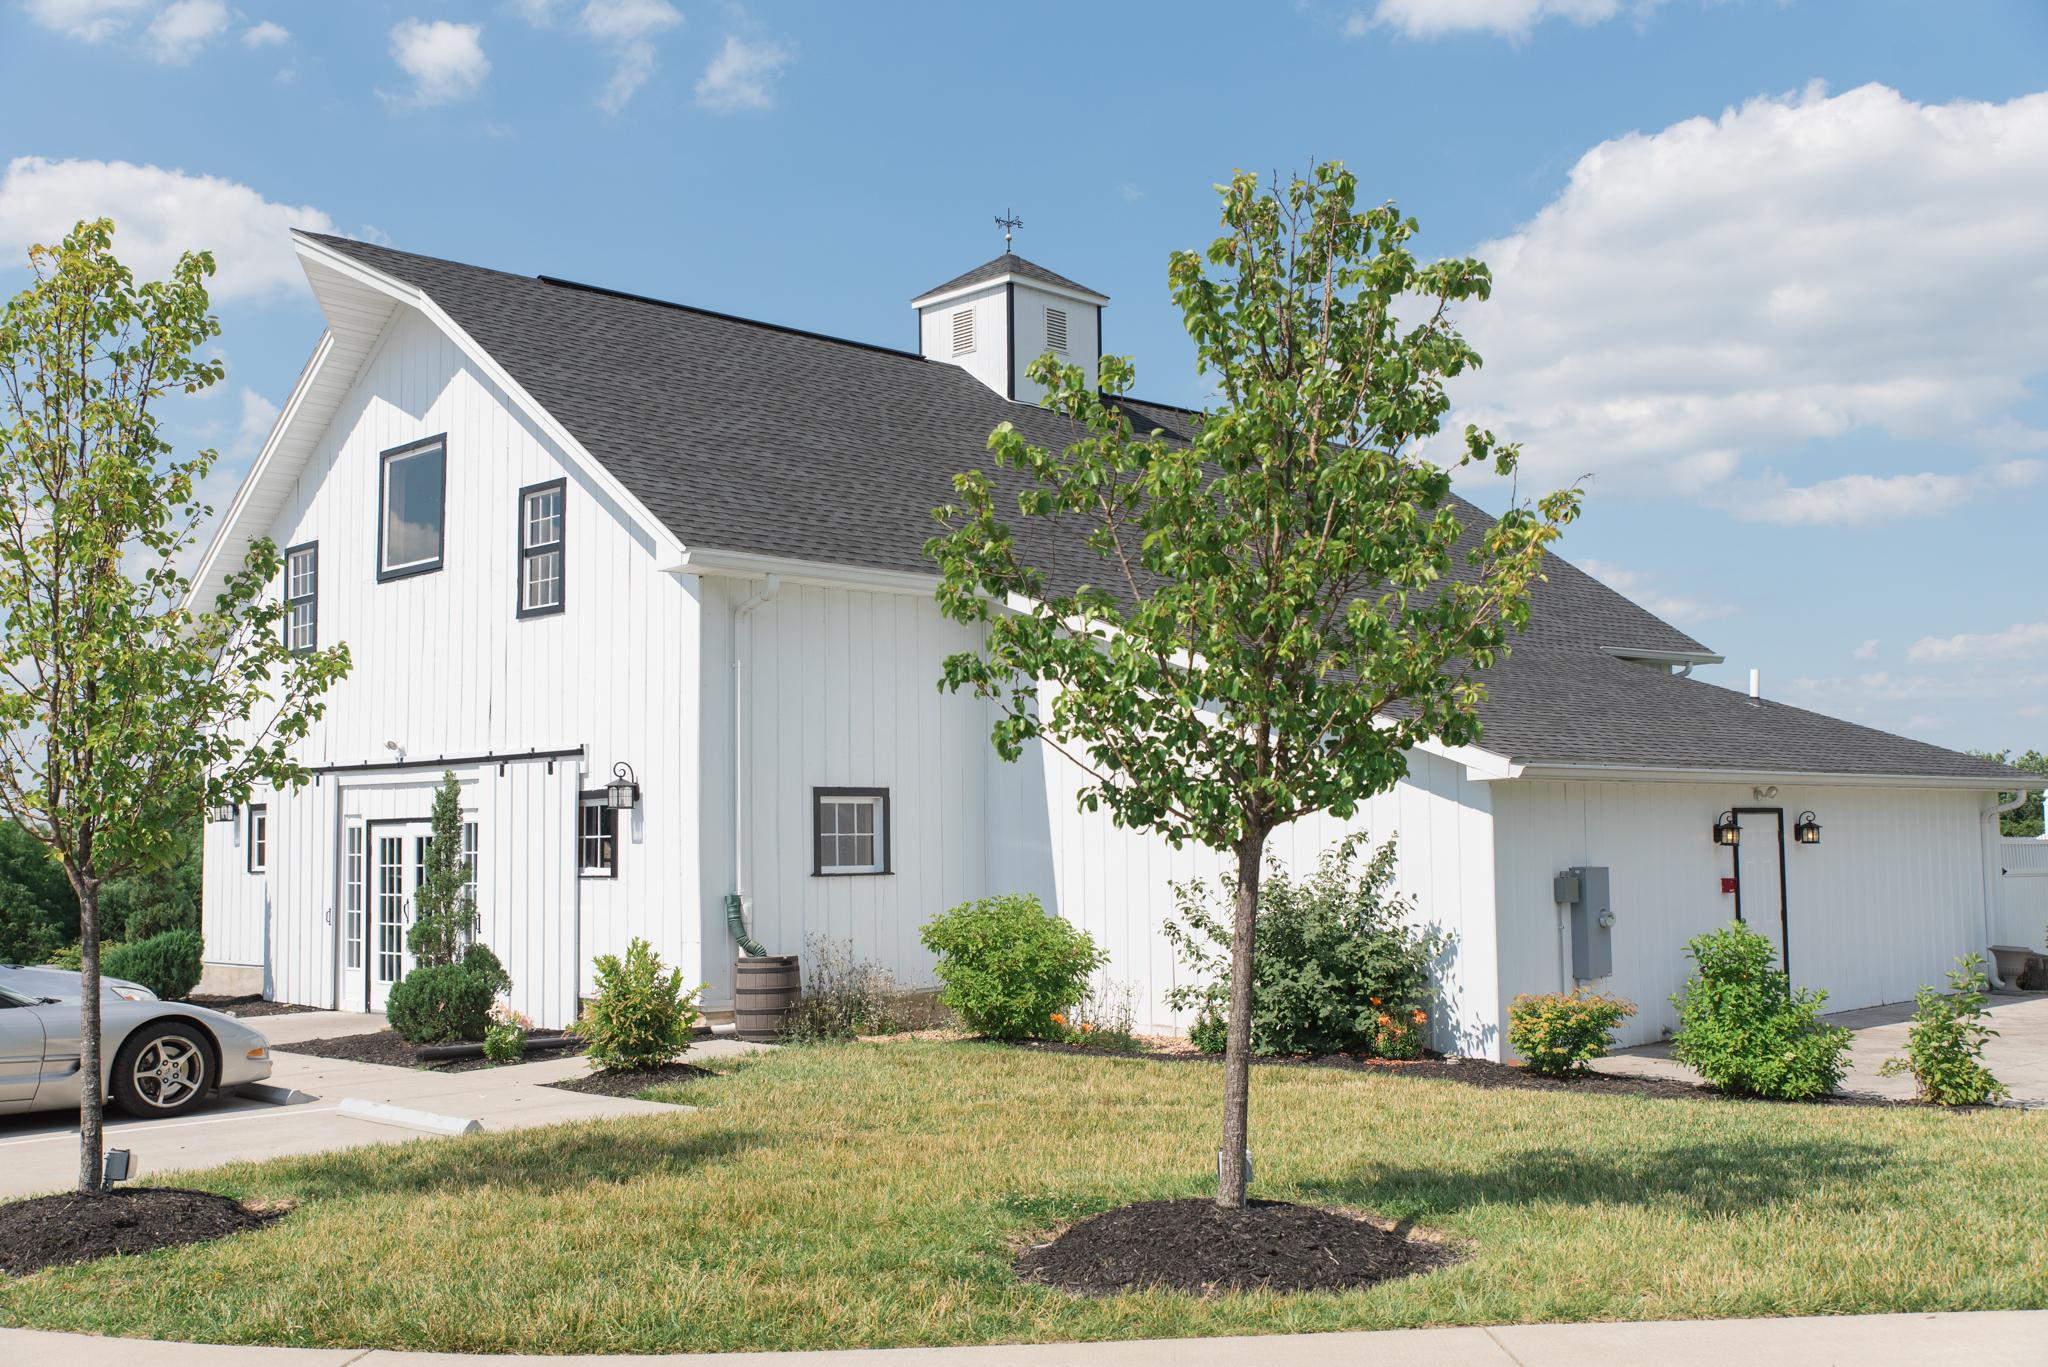 wedding barn, Kentucky wedding barn, Dry Ridge, Lexington, Winchester, Mt Sterling, West Chester